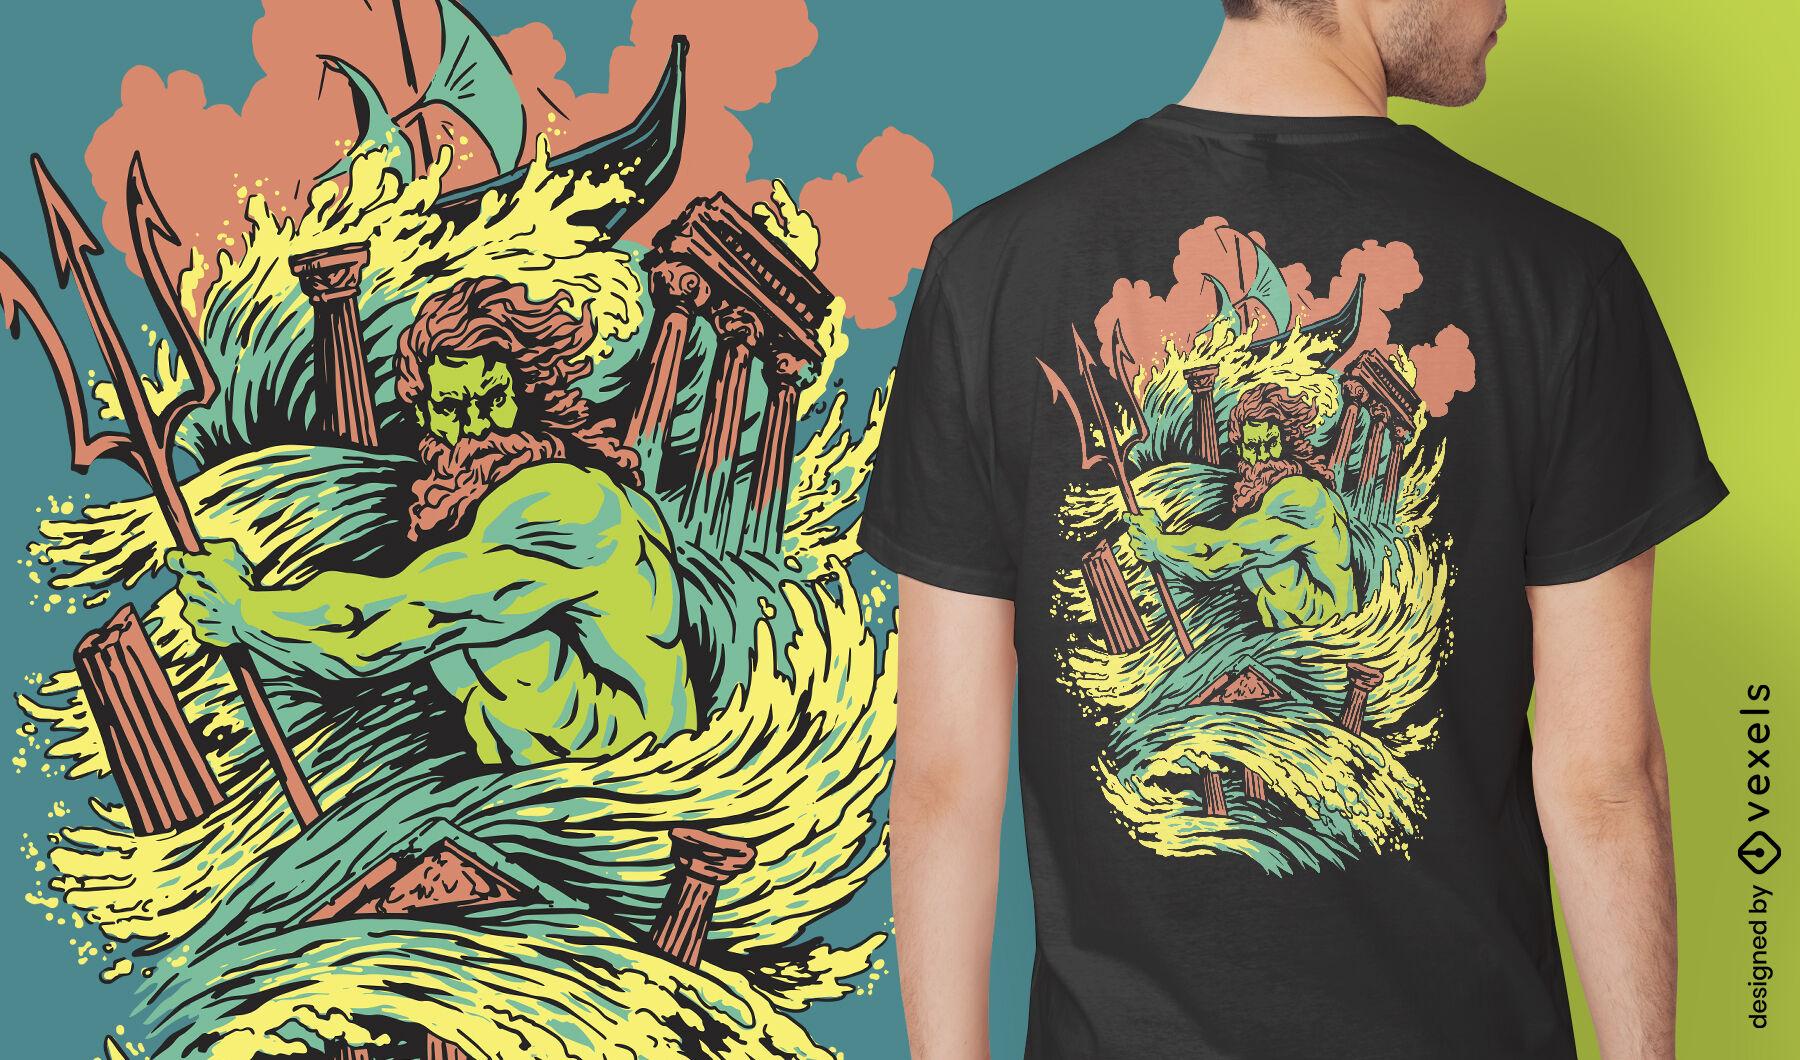 Poseidon god mythical greece t-shirt design